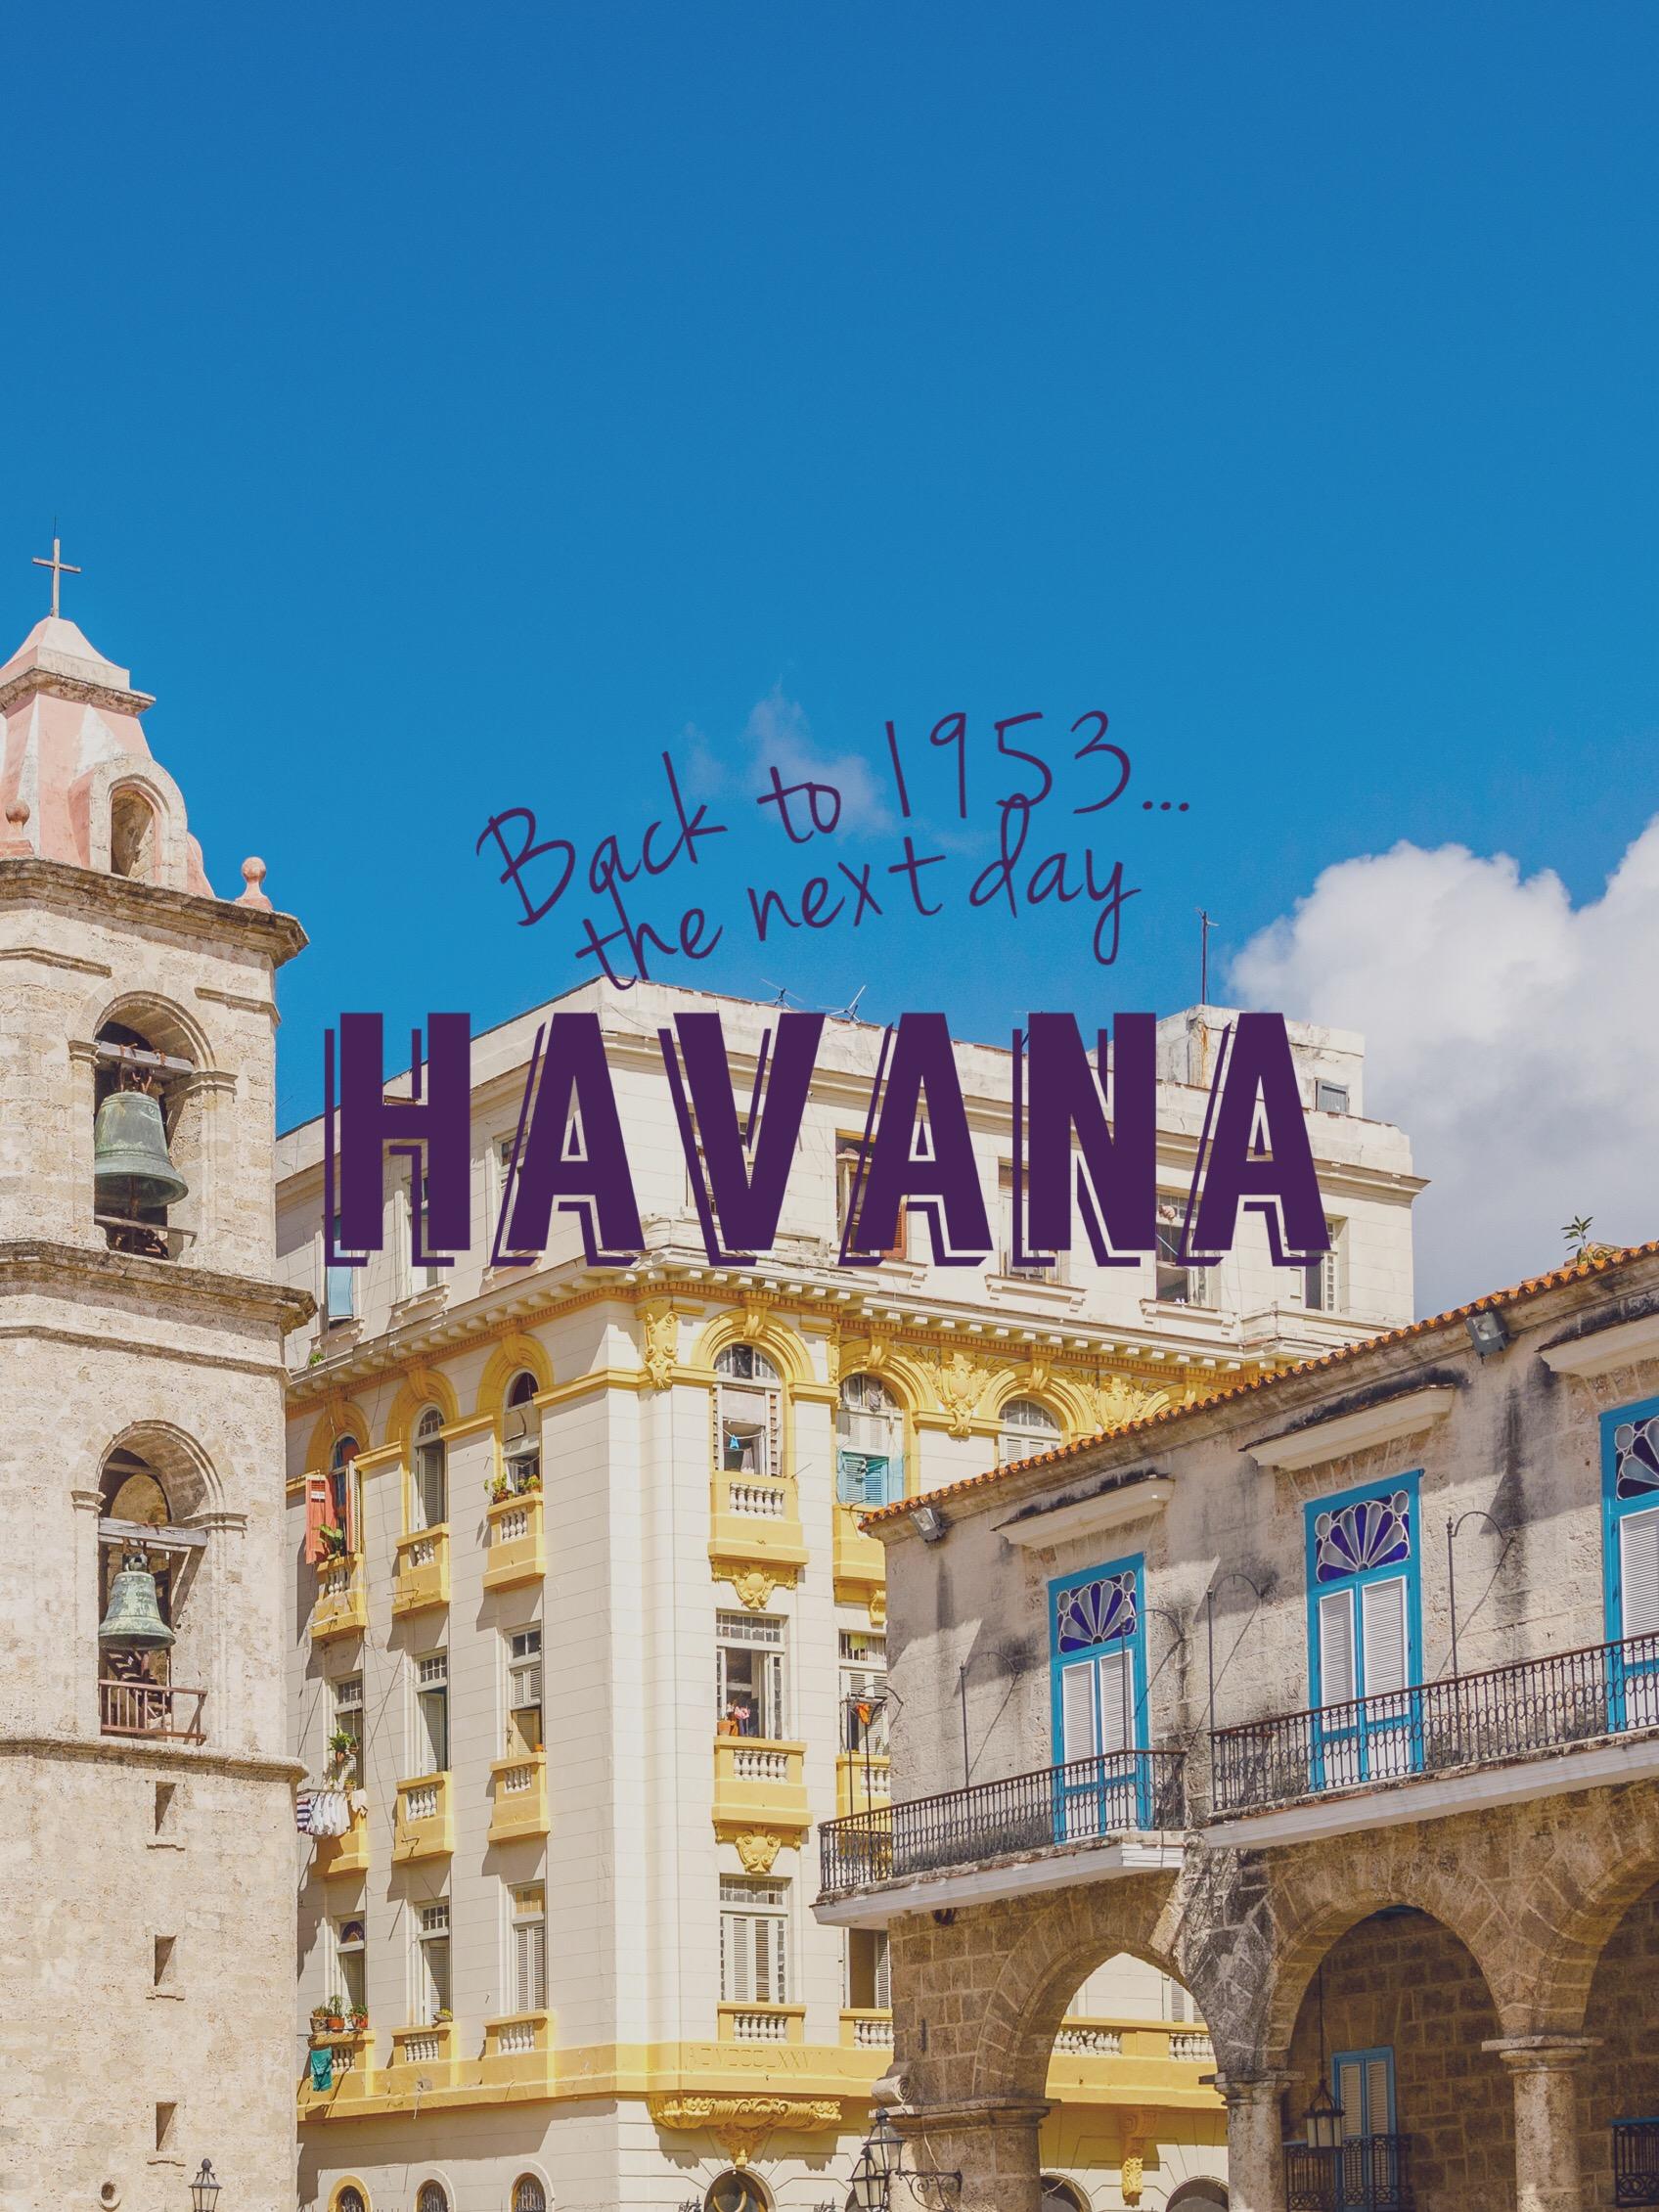 Back to 1953 – Exploring Old Havana